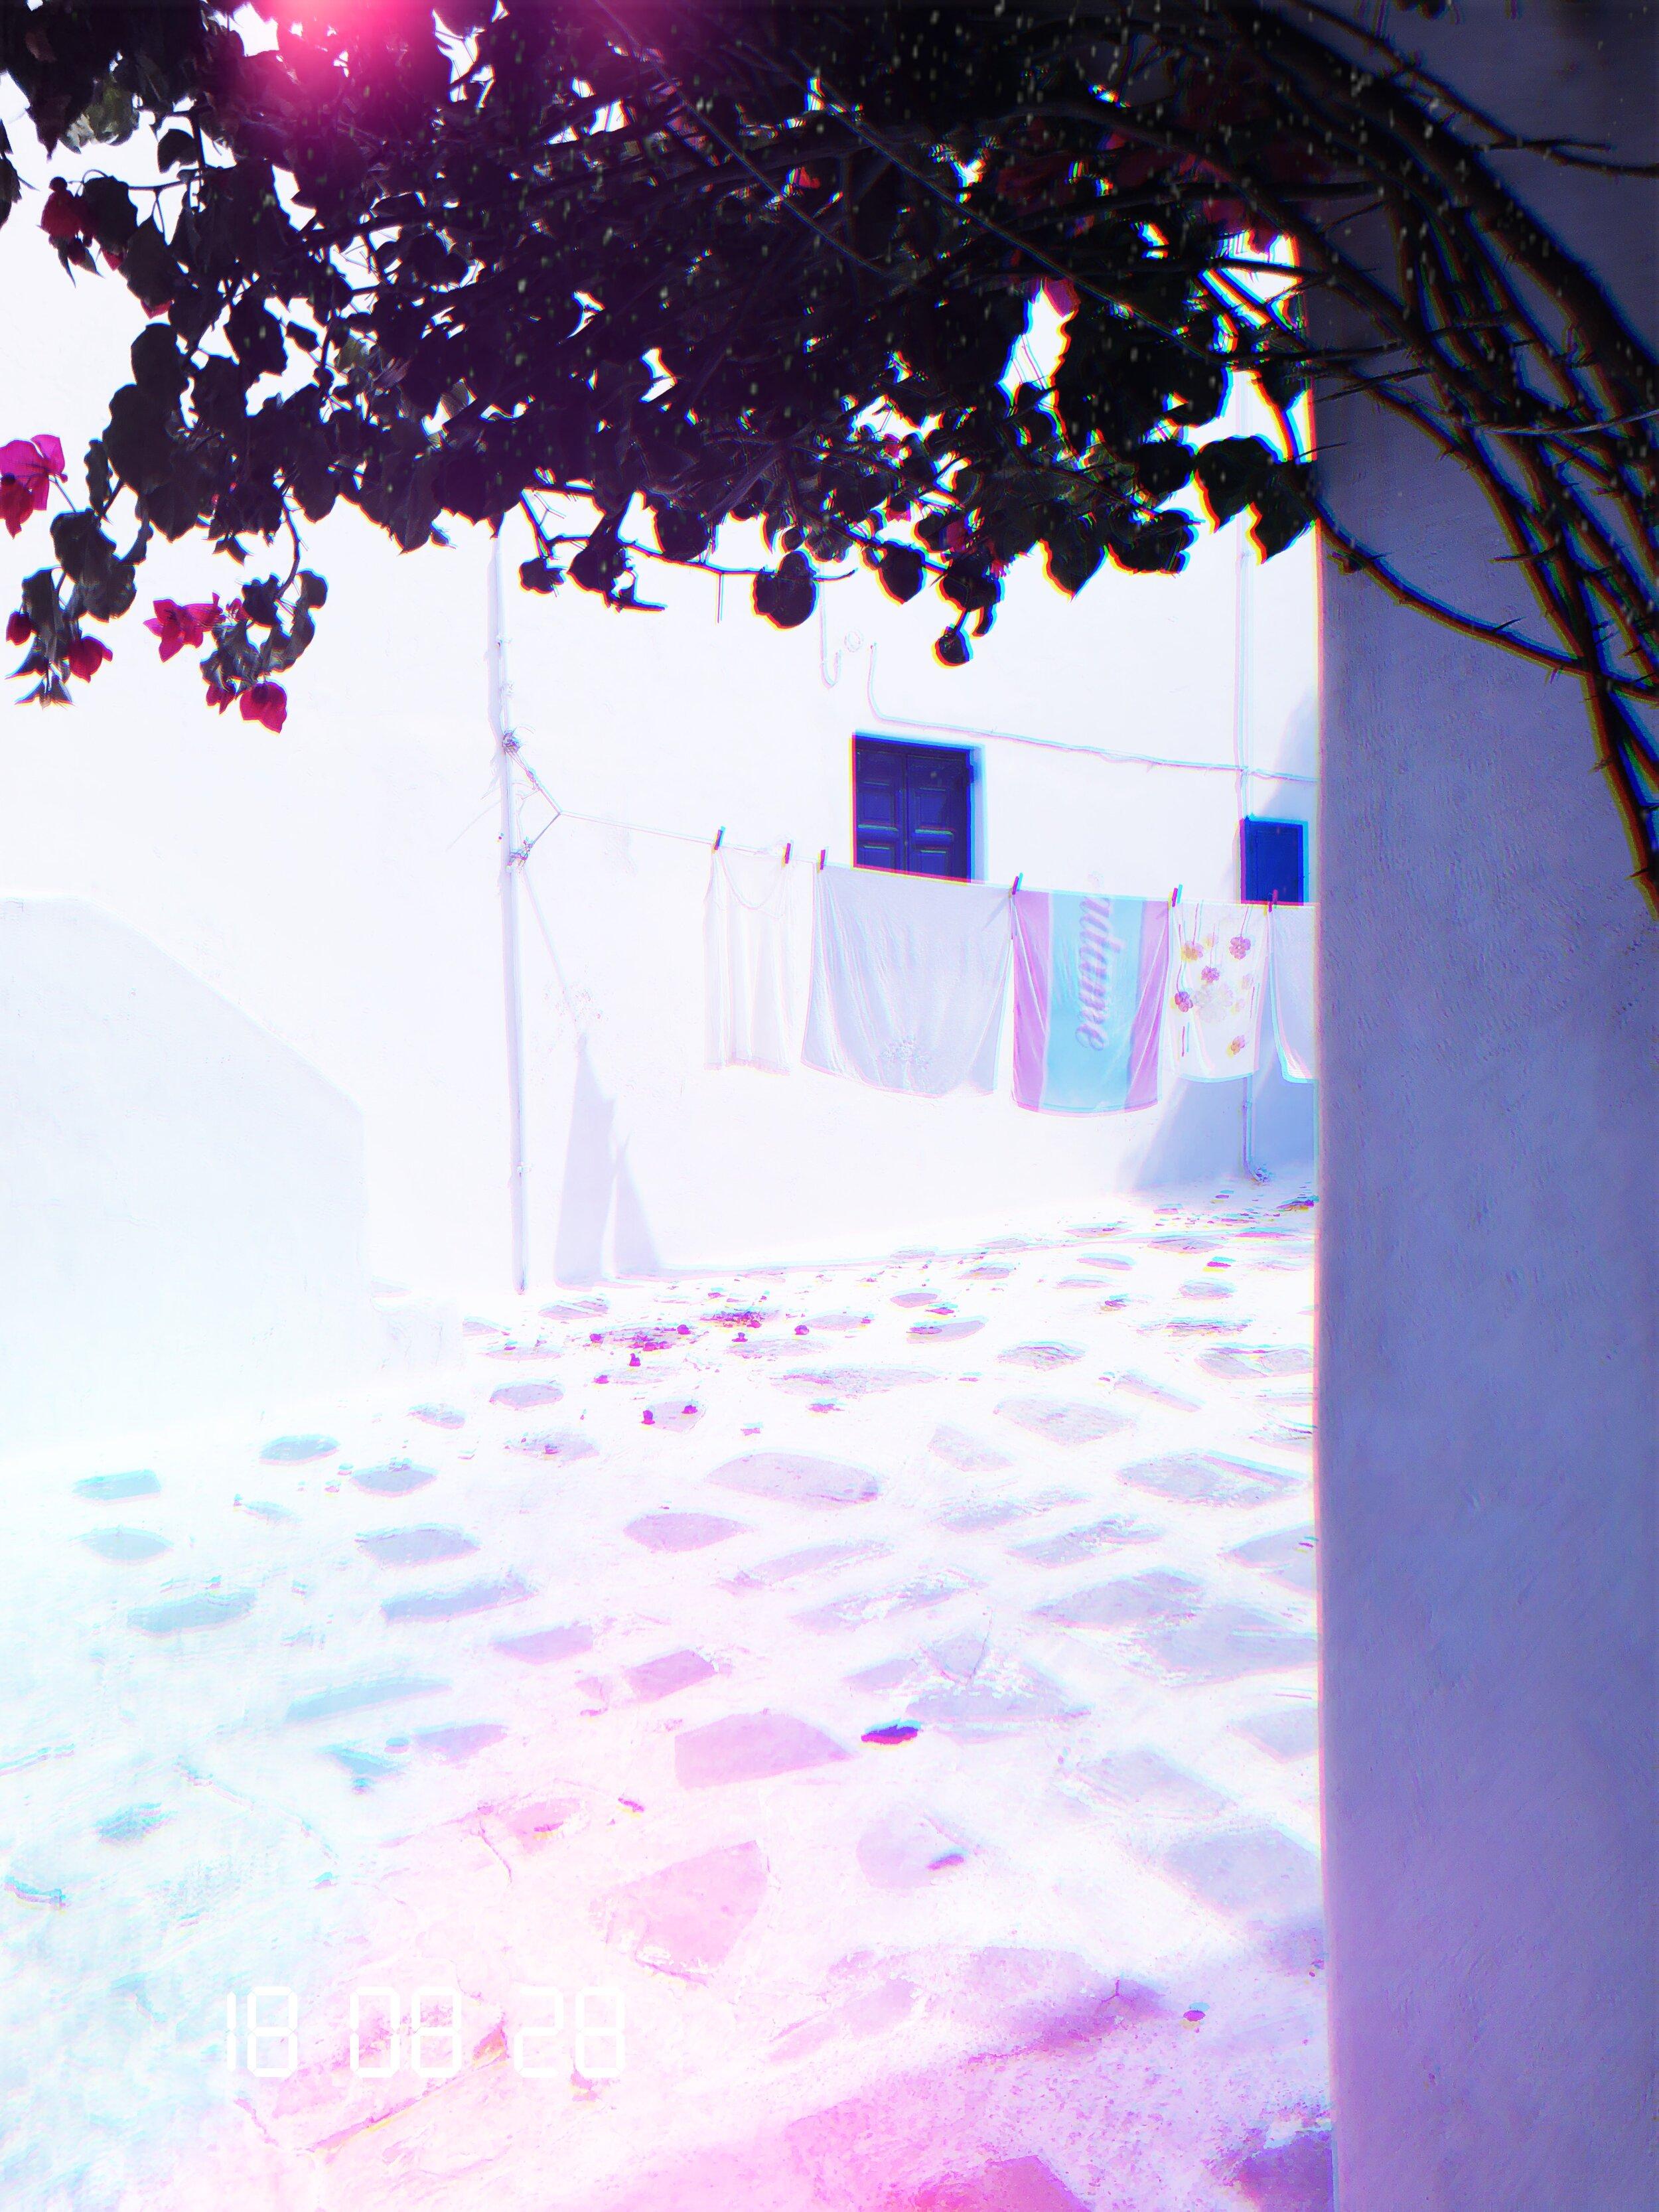 Mykonos - GREECE (COMING SOON)